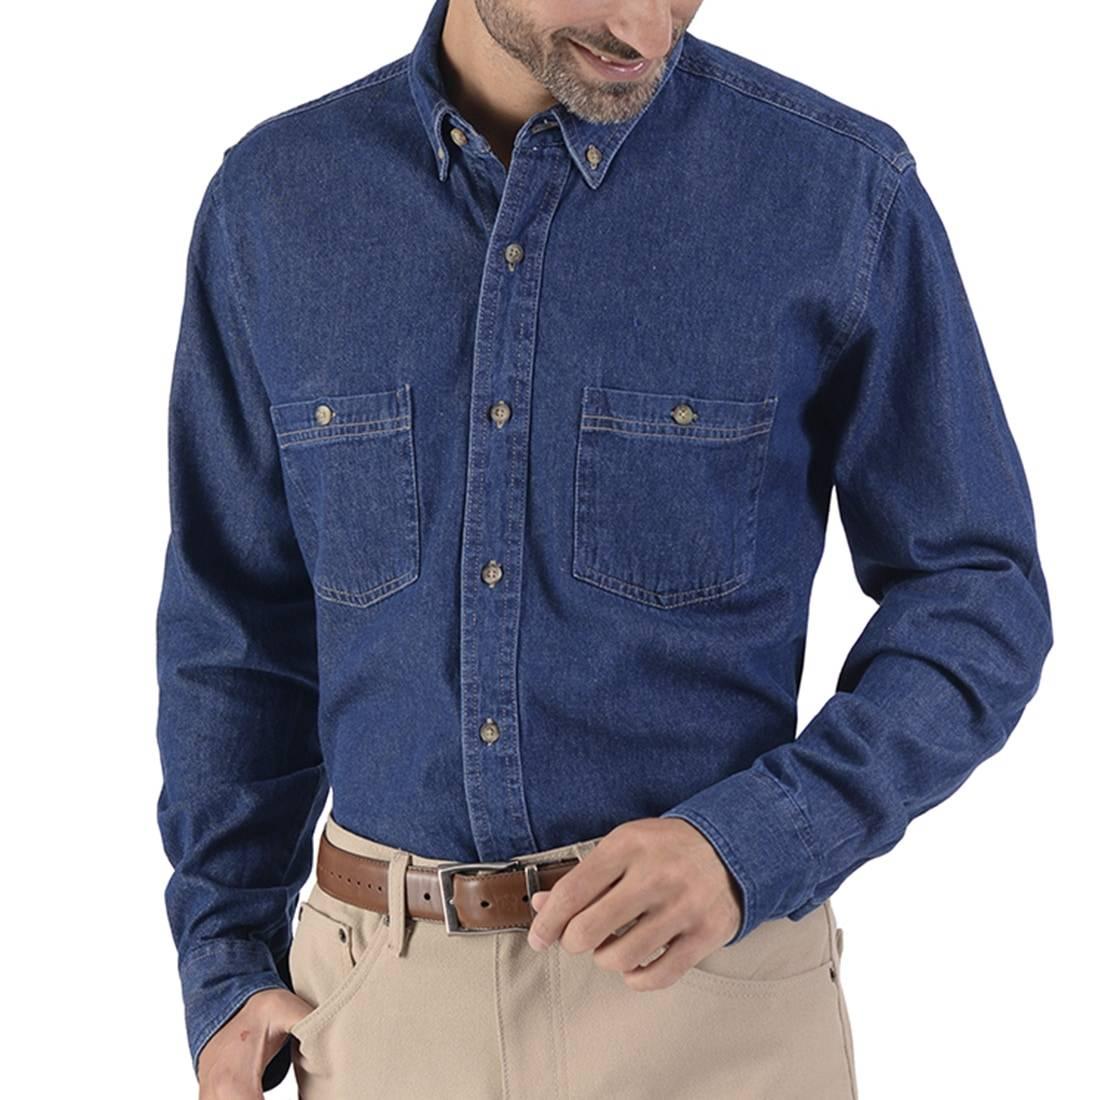 041899351619-01-Camisa-Mezclilla-Manga-Larga-Classic-Fit-Suavizado-yale